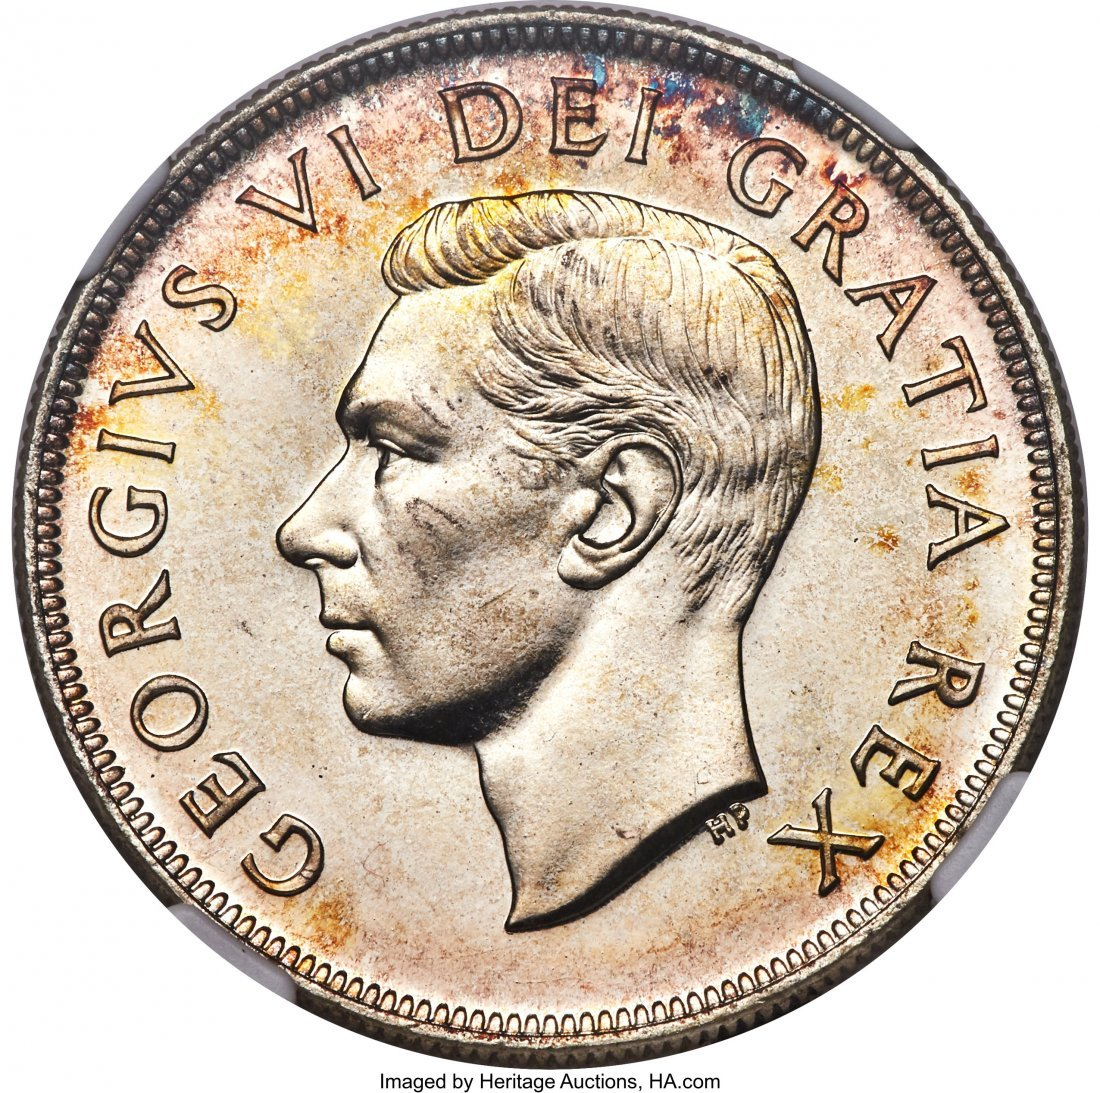 31335: George VI Prooflike Dollar 1951 PL67 NGC, Royal